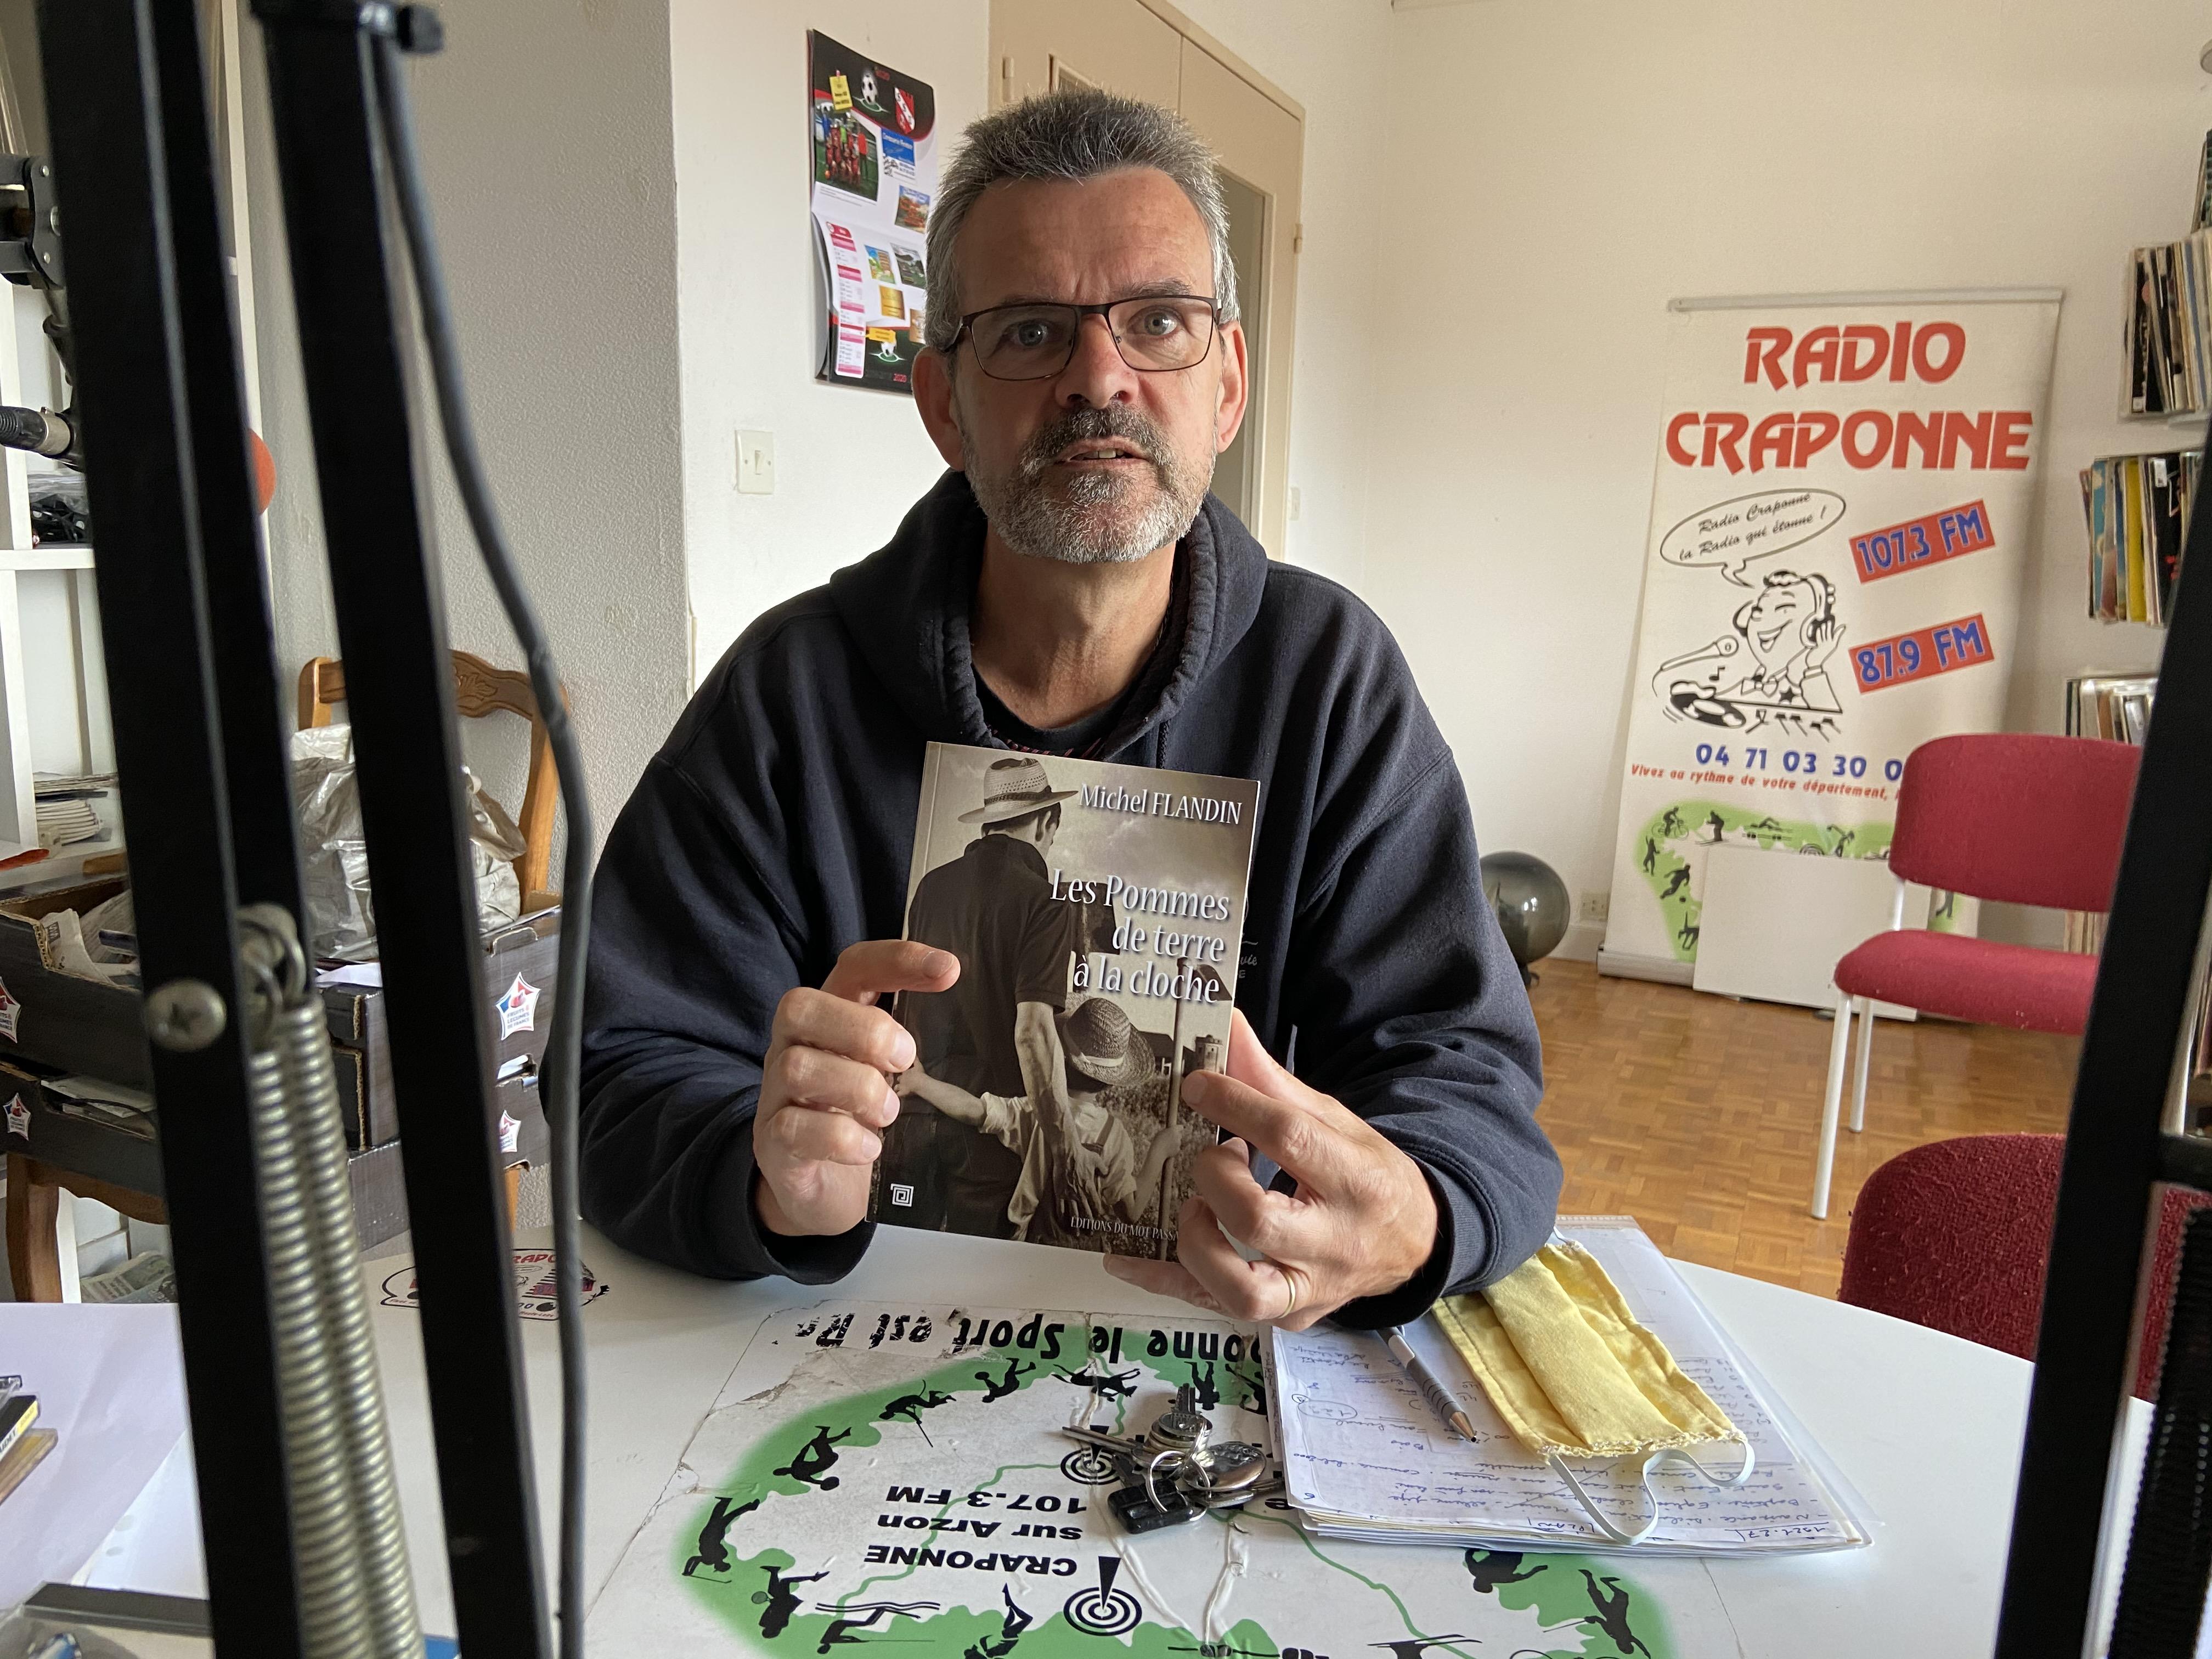 invite du jeudi Michel flandin pour son roman les pommes de terre a la cloche